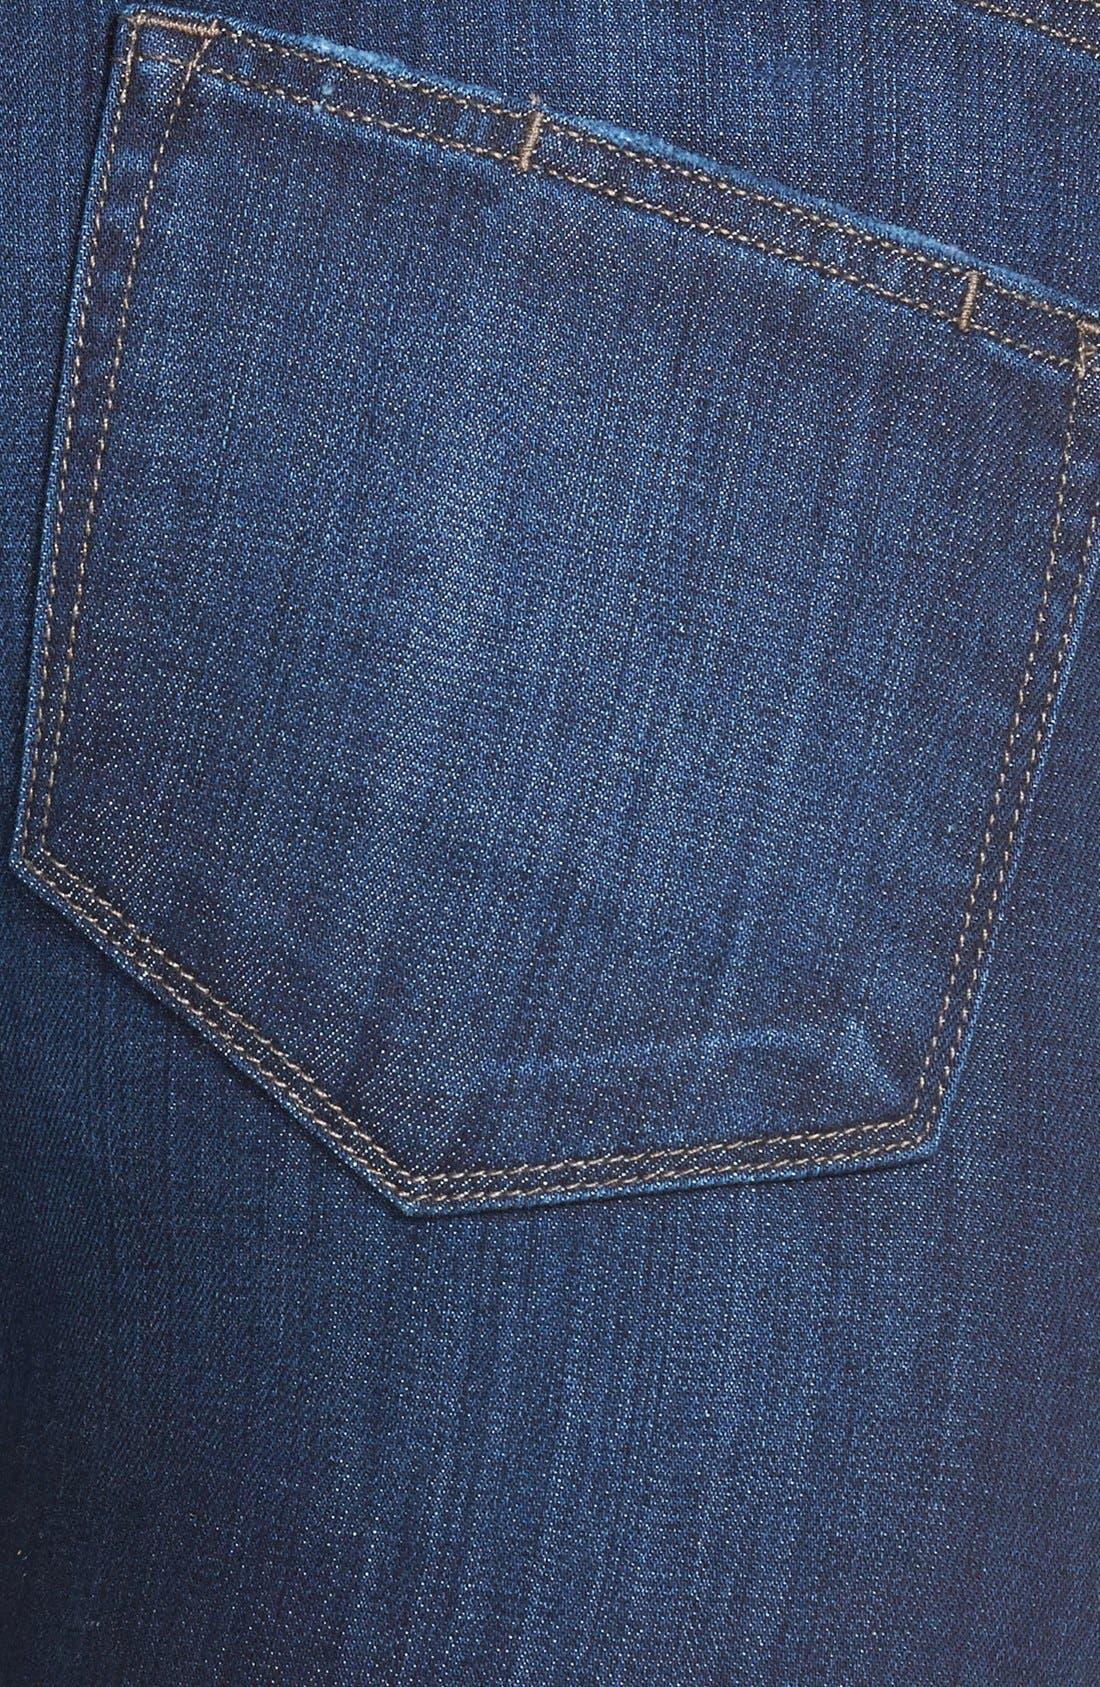 Alternate Image 3  - Paige Denim 'Skyline' Ankle Peg Skinny Jeans (Dixie) (Nordstrom Exclusive)